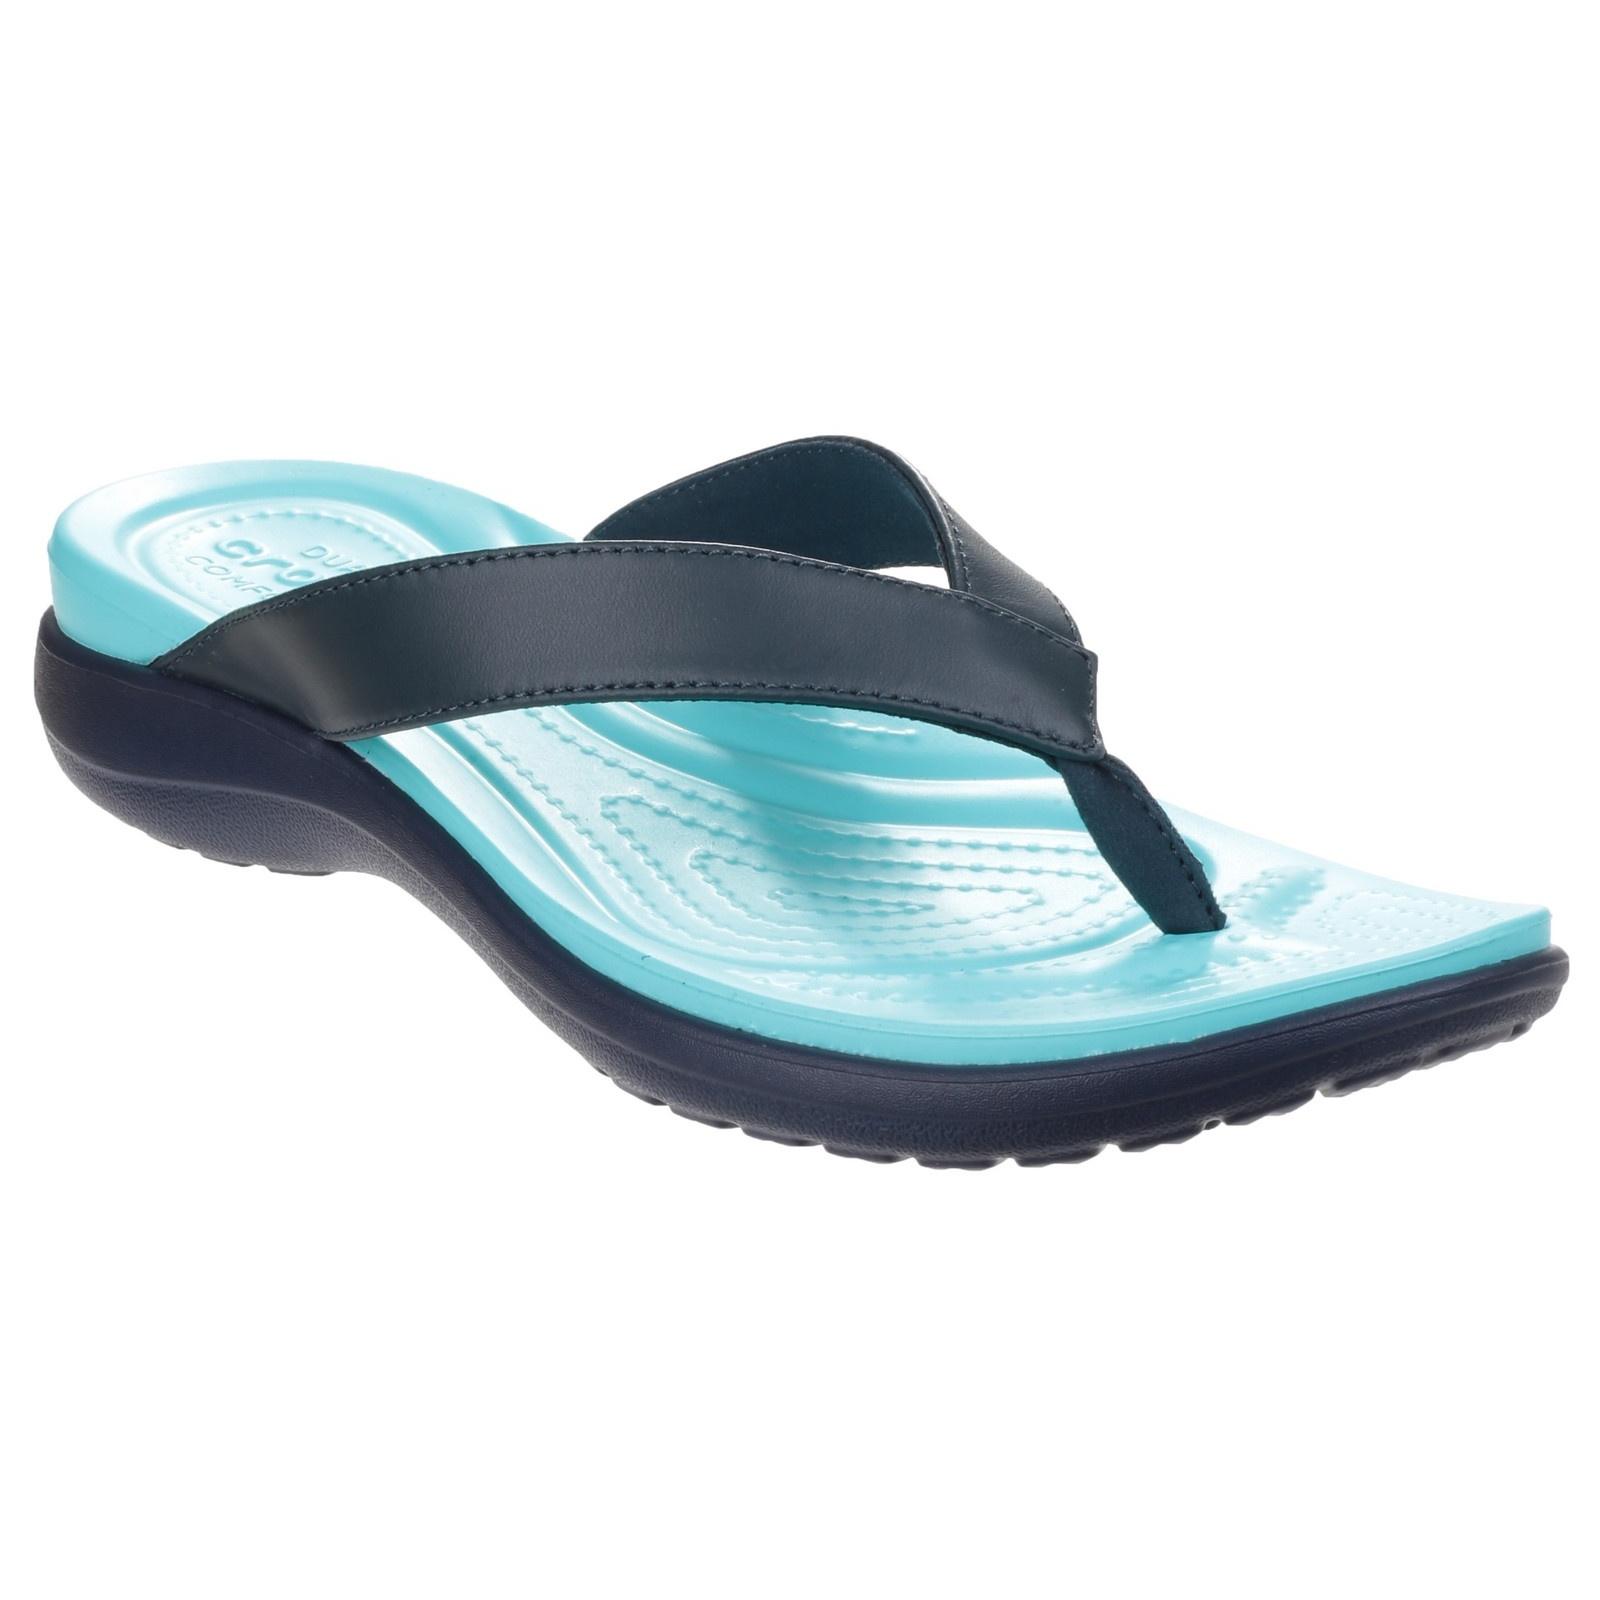 Crocs Womens/Ladies Capri V Summer Flip Flops | eBay - photo#43